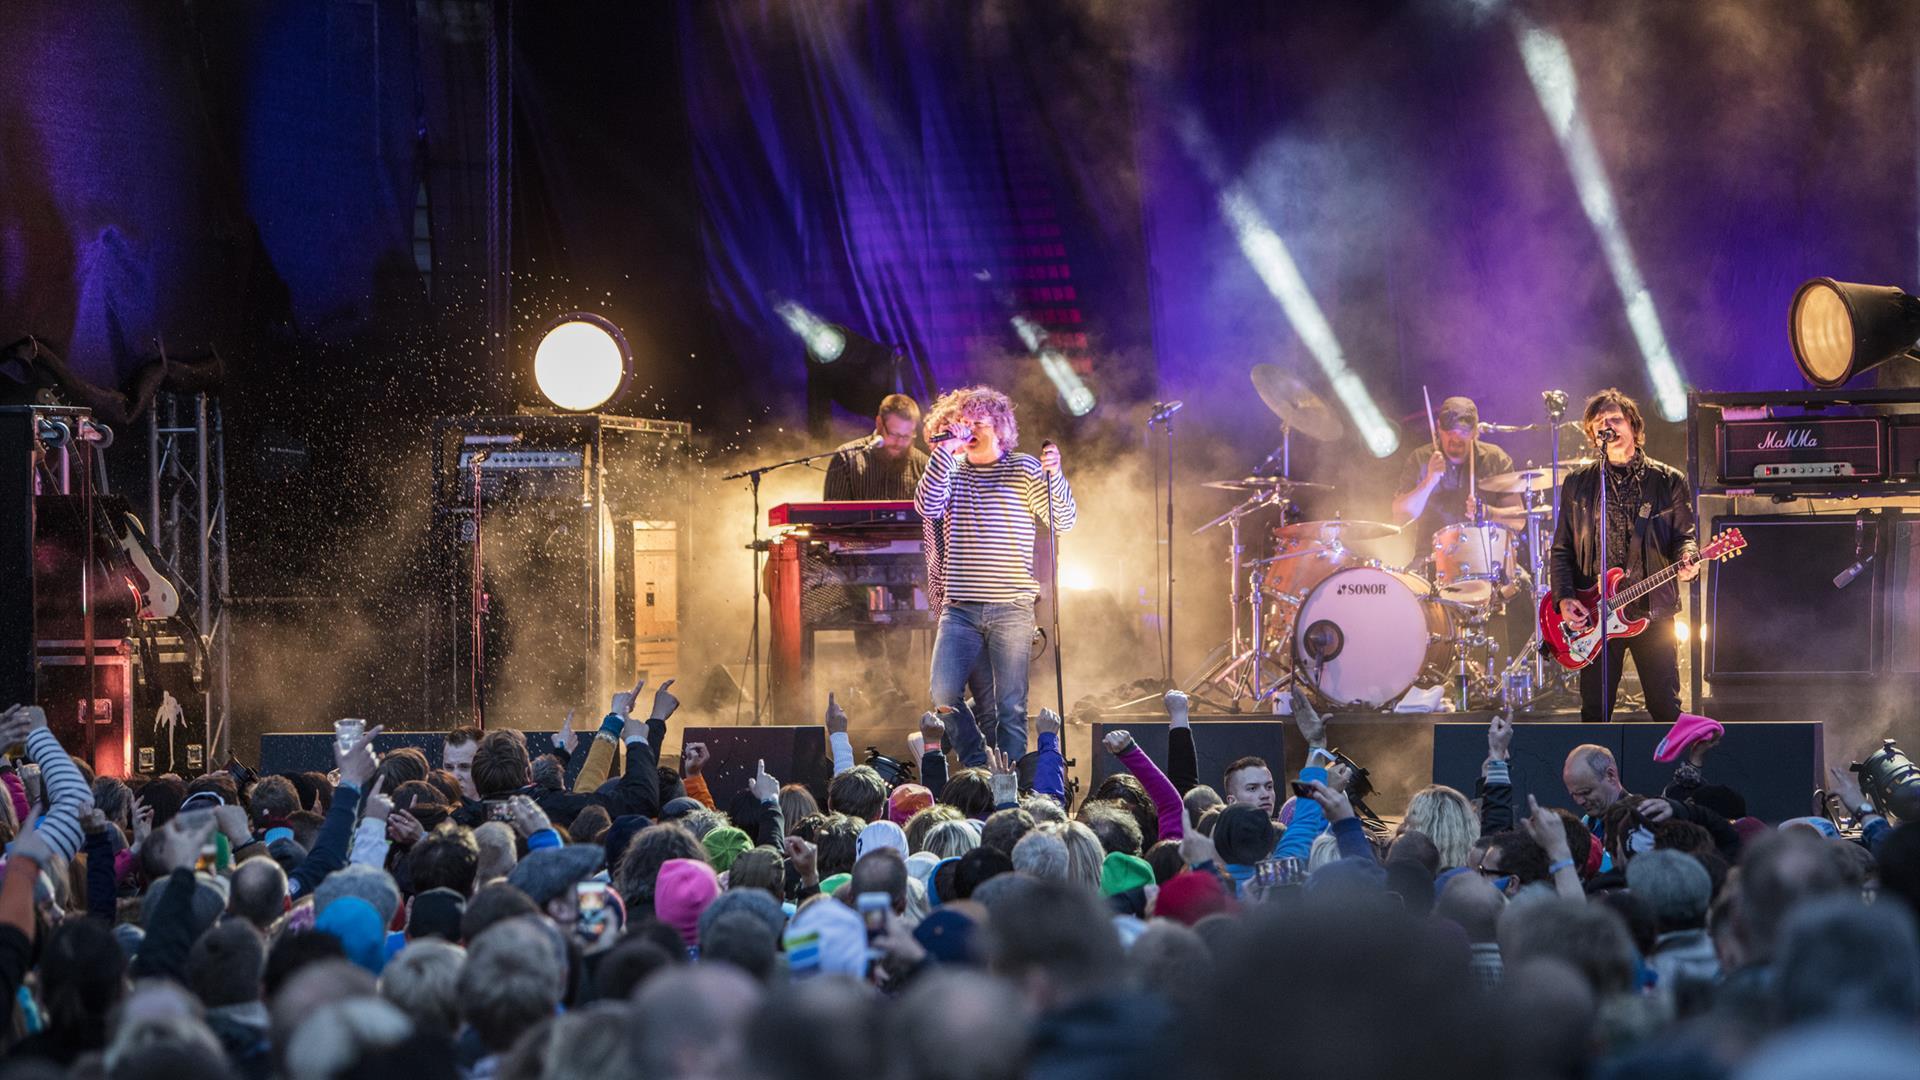 Fjellfestivalen Rondaståk